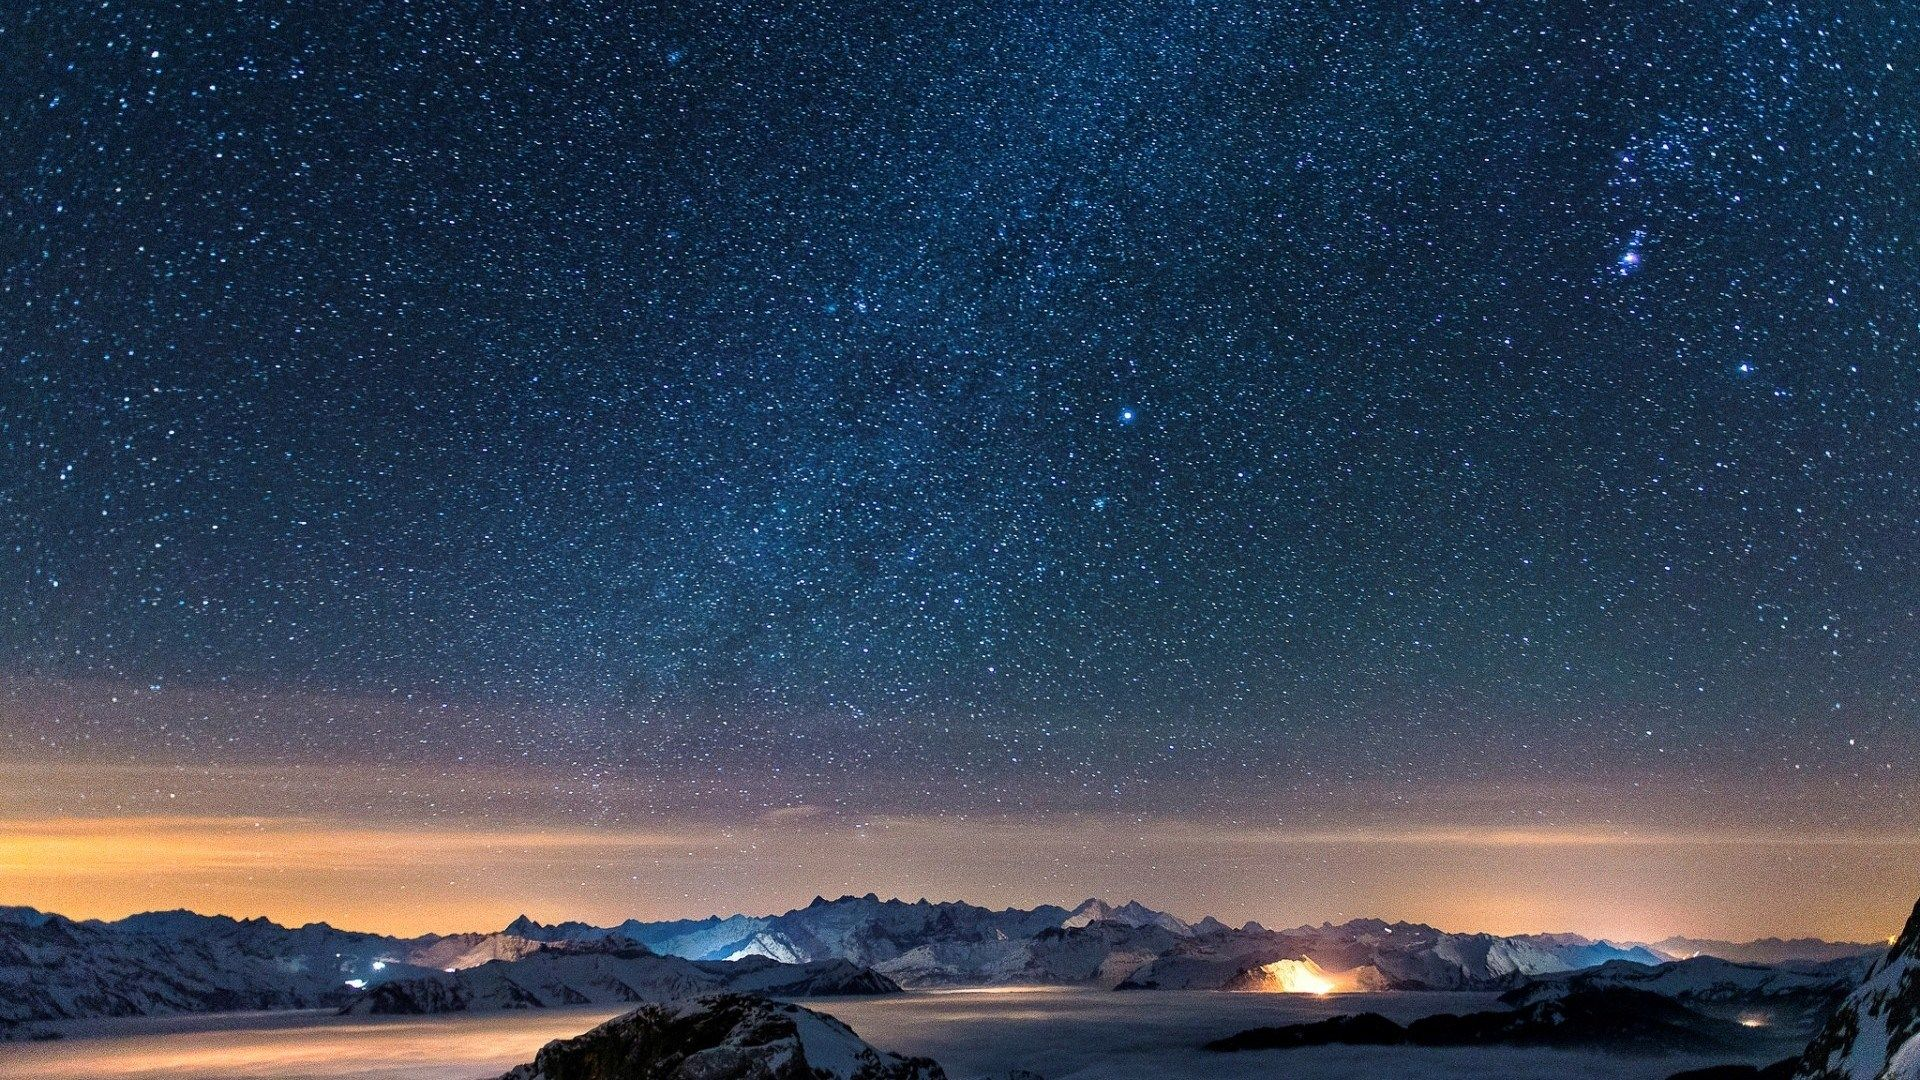 1920x1080 Night Sky Wallpaper Hd Backgrounds Images Jpg 766 Kb 1080p Hd 1080p Hd Sky